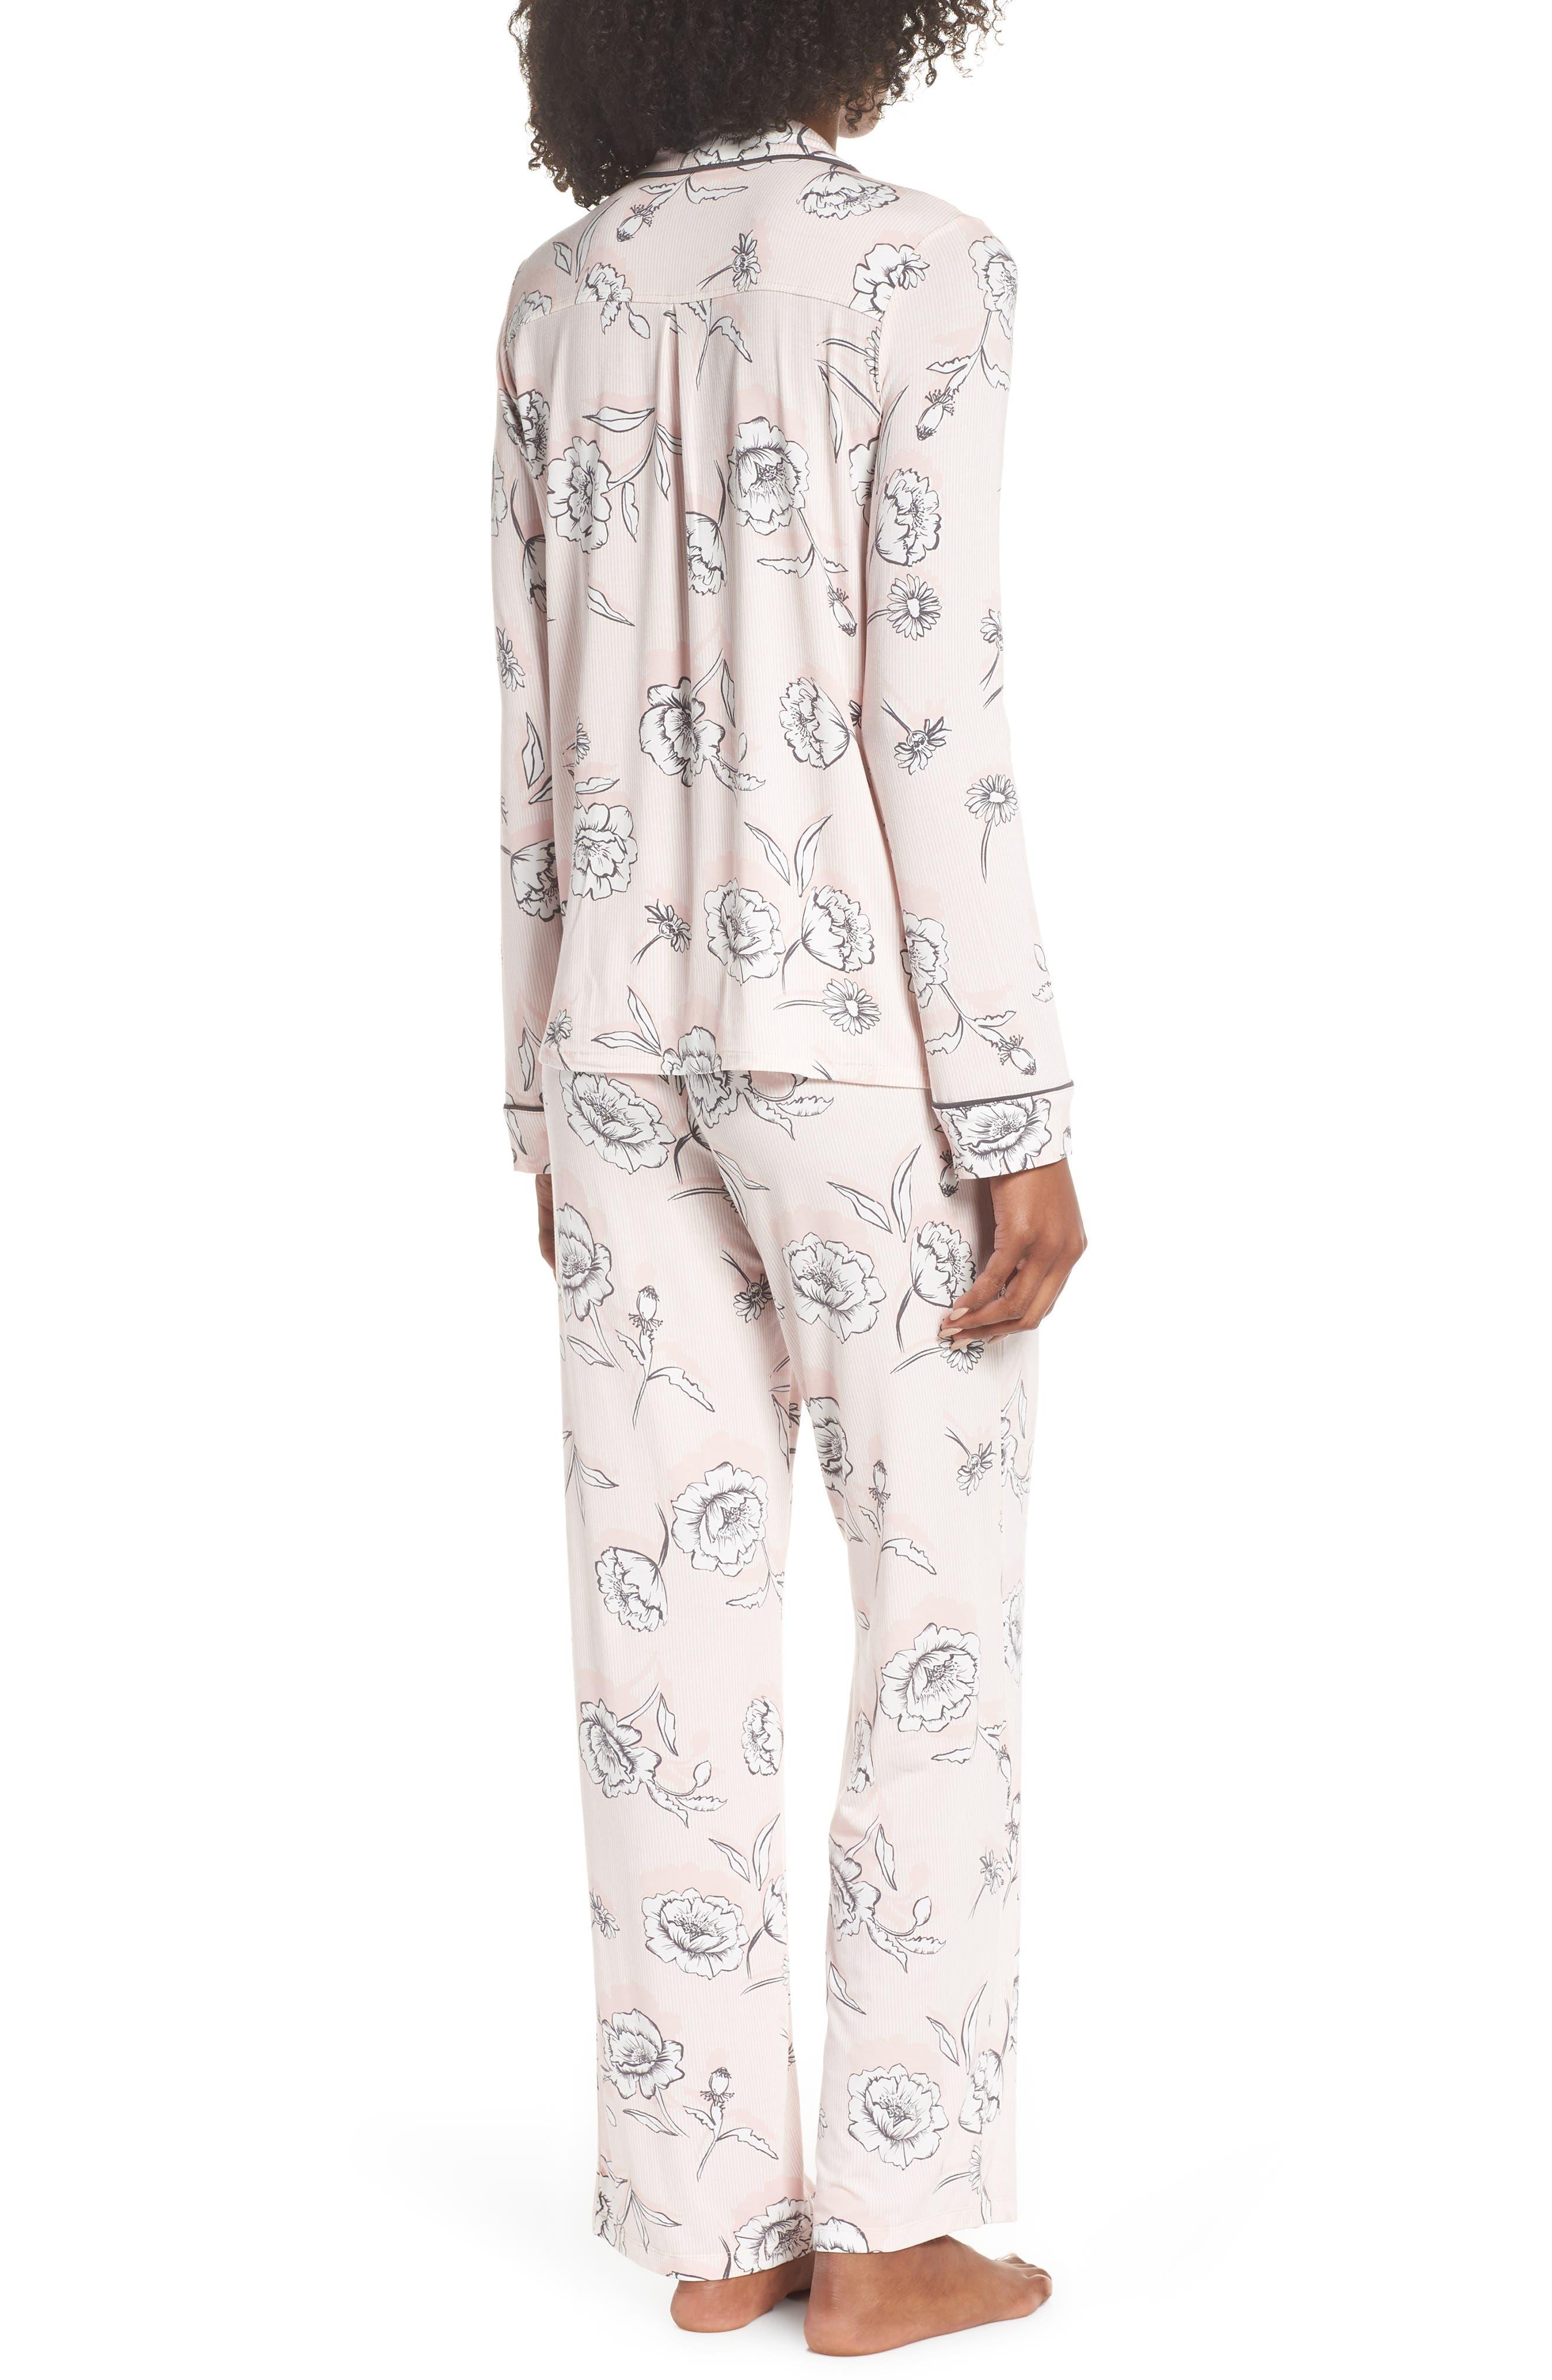 Shadow Floral Pajamas,                             Alternate thumbnail 2, color,                             650